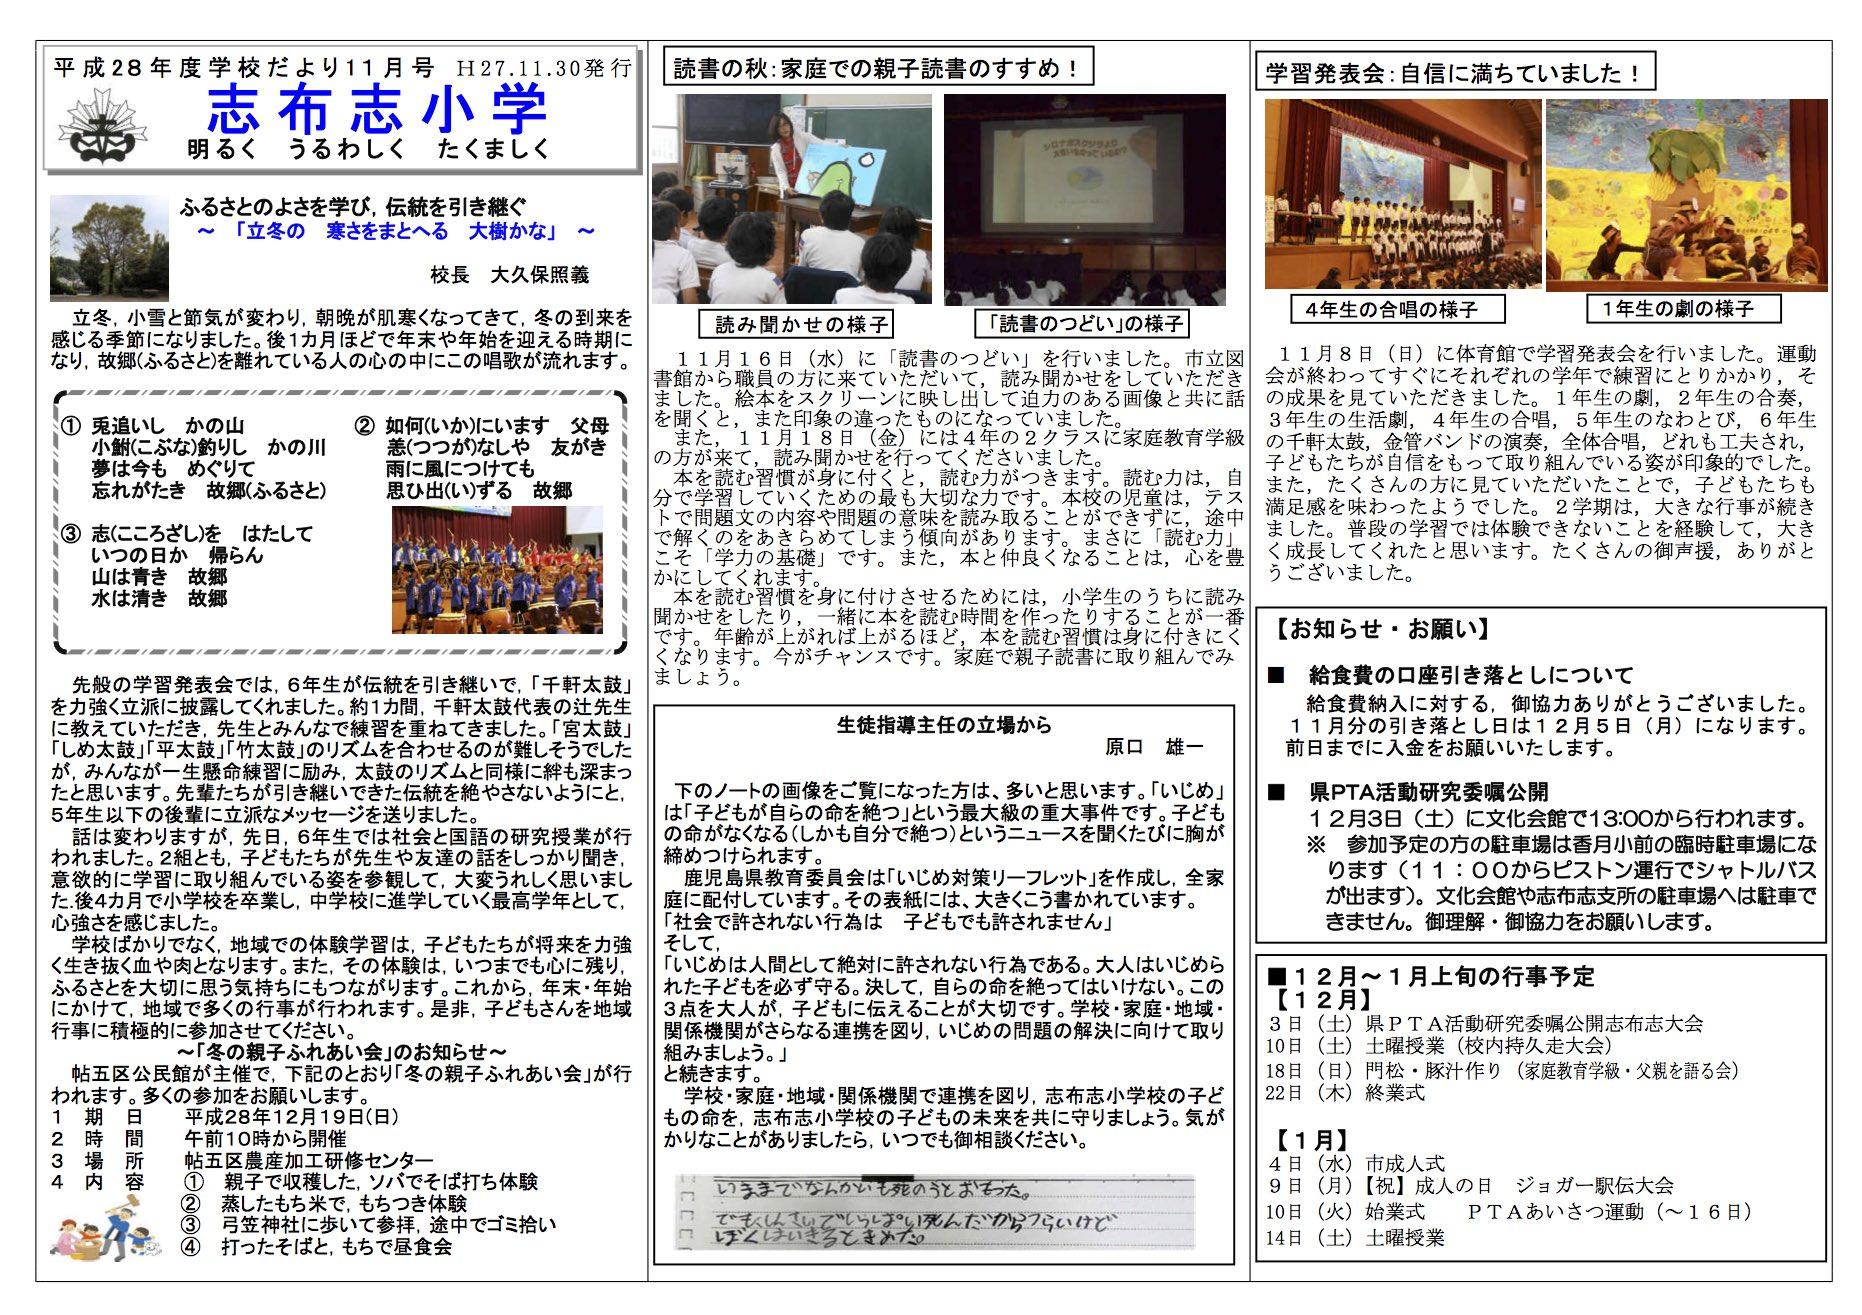 h28-shibushi-els-gakkoudayori11